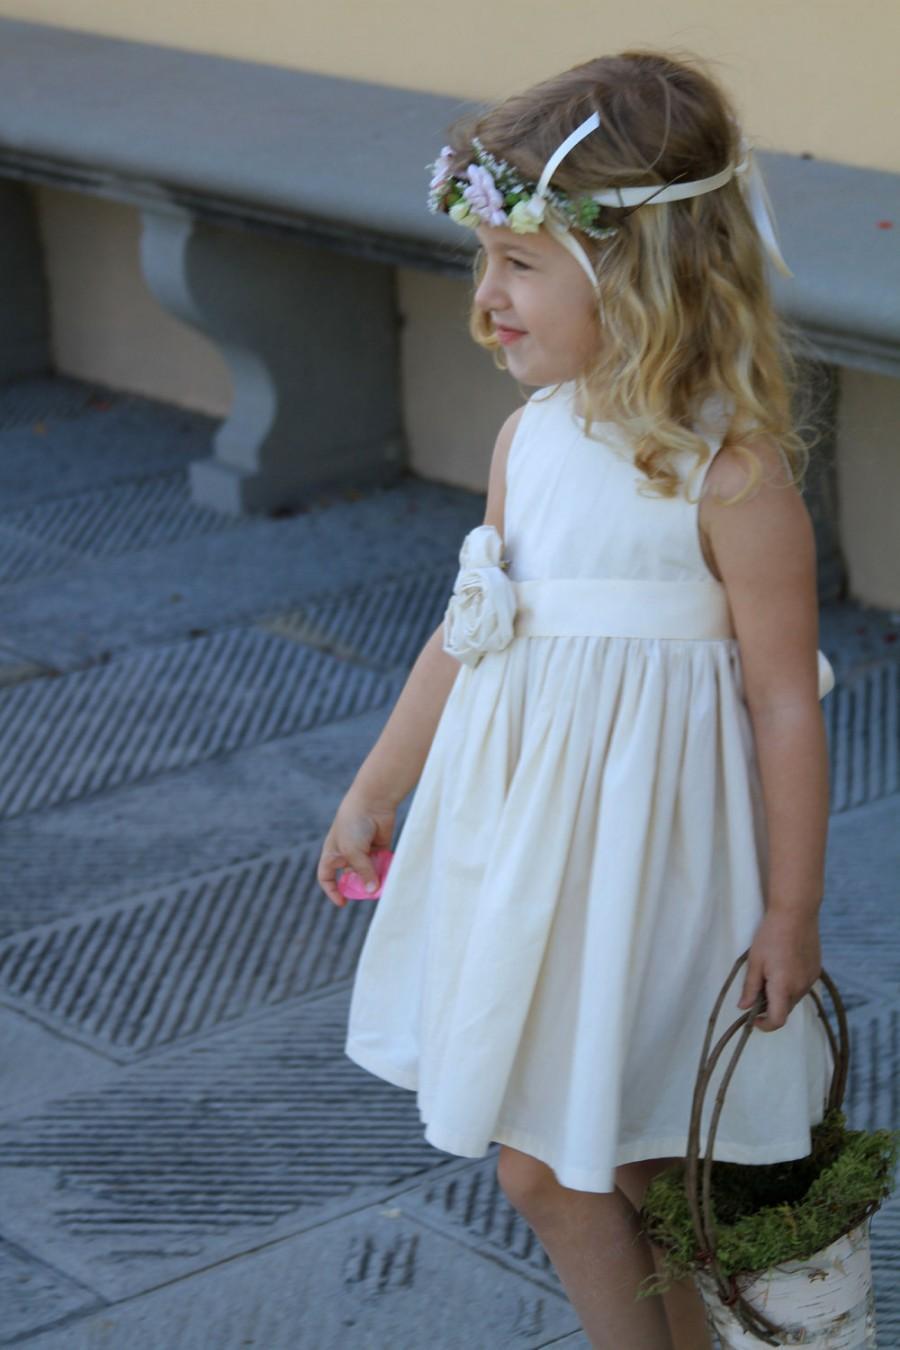 Wedding - Rustic flower girl dress, country flower girl dress, beach flower girl dress, cotton flower girl dress